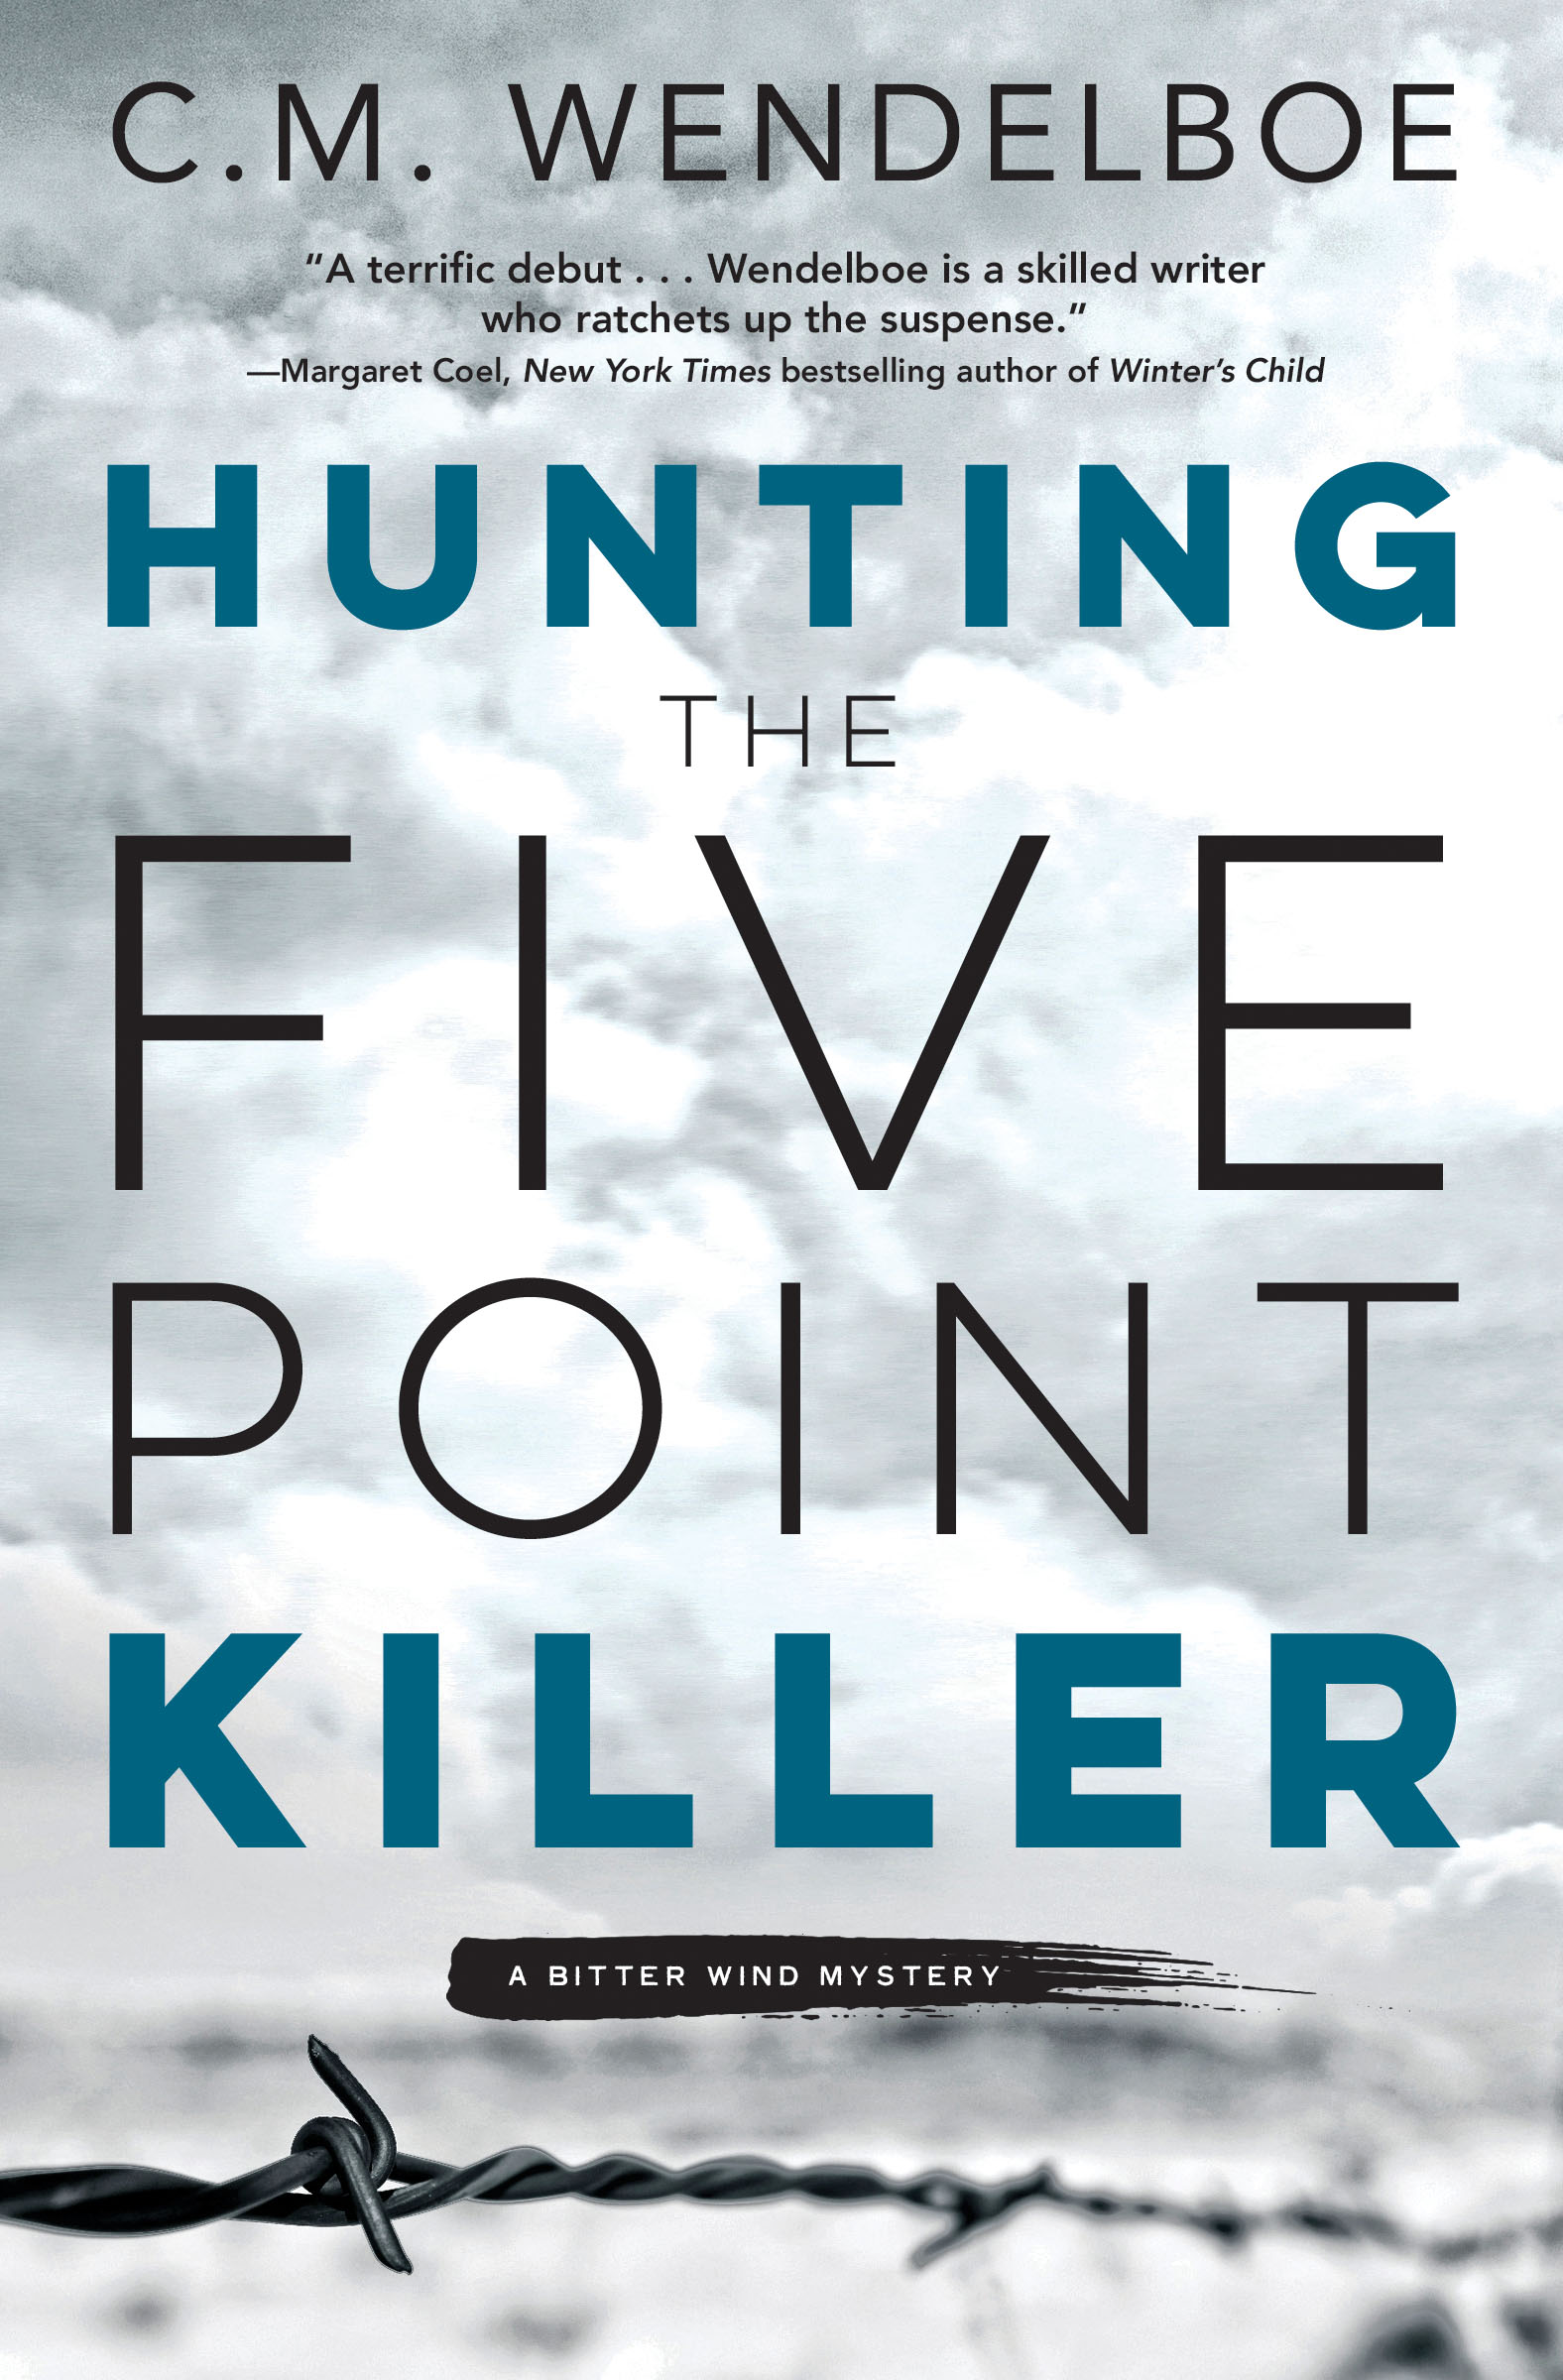 pr_cover_bitter_wind_1_hunting_the_five_point_killer.jpg